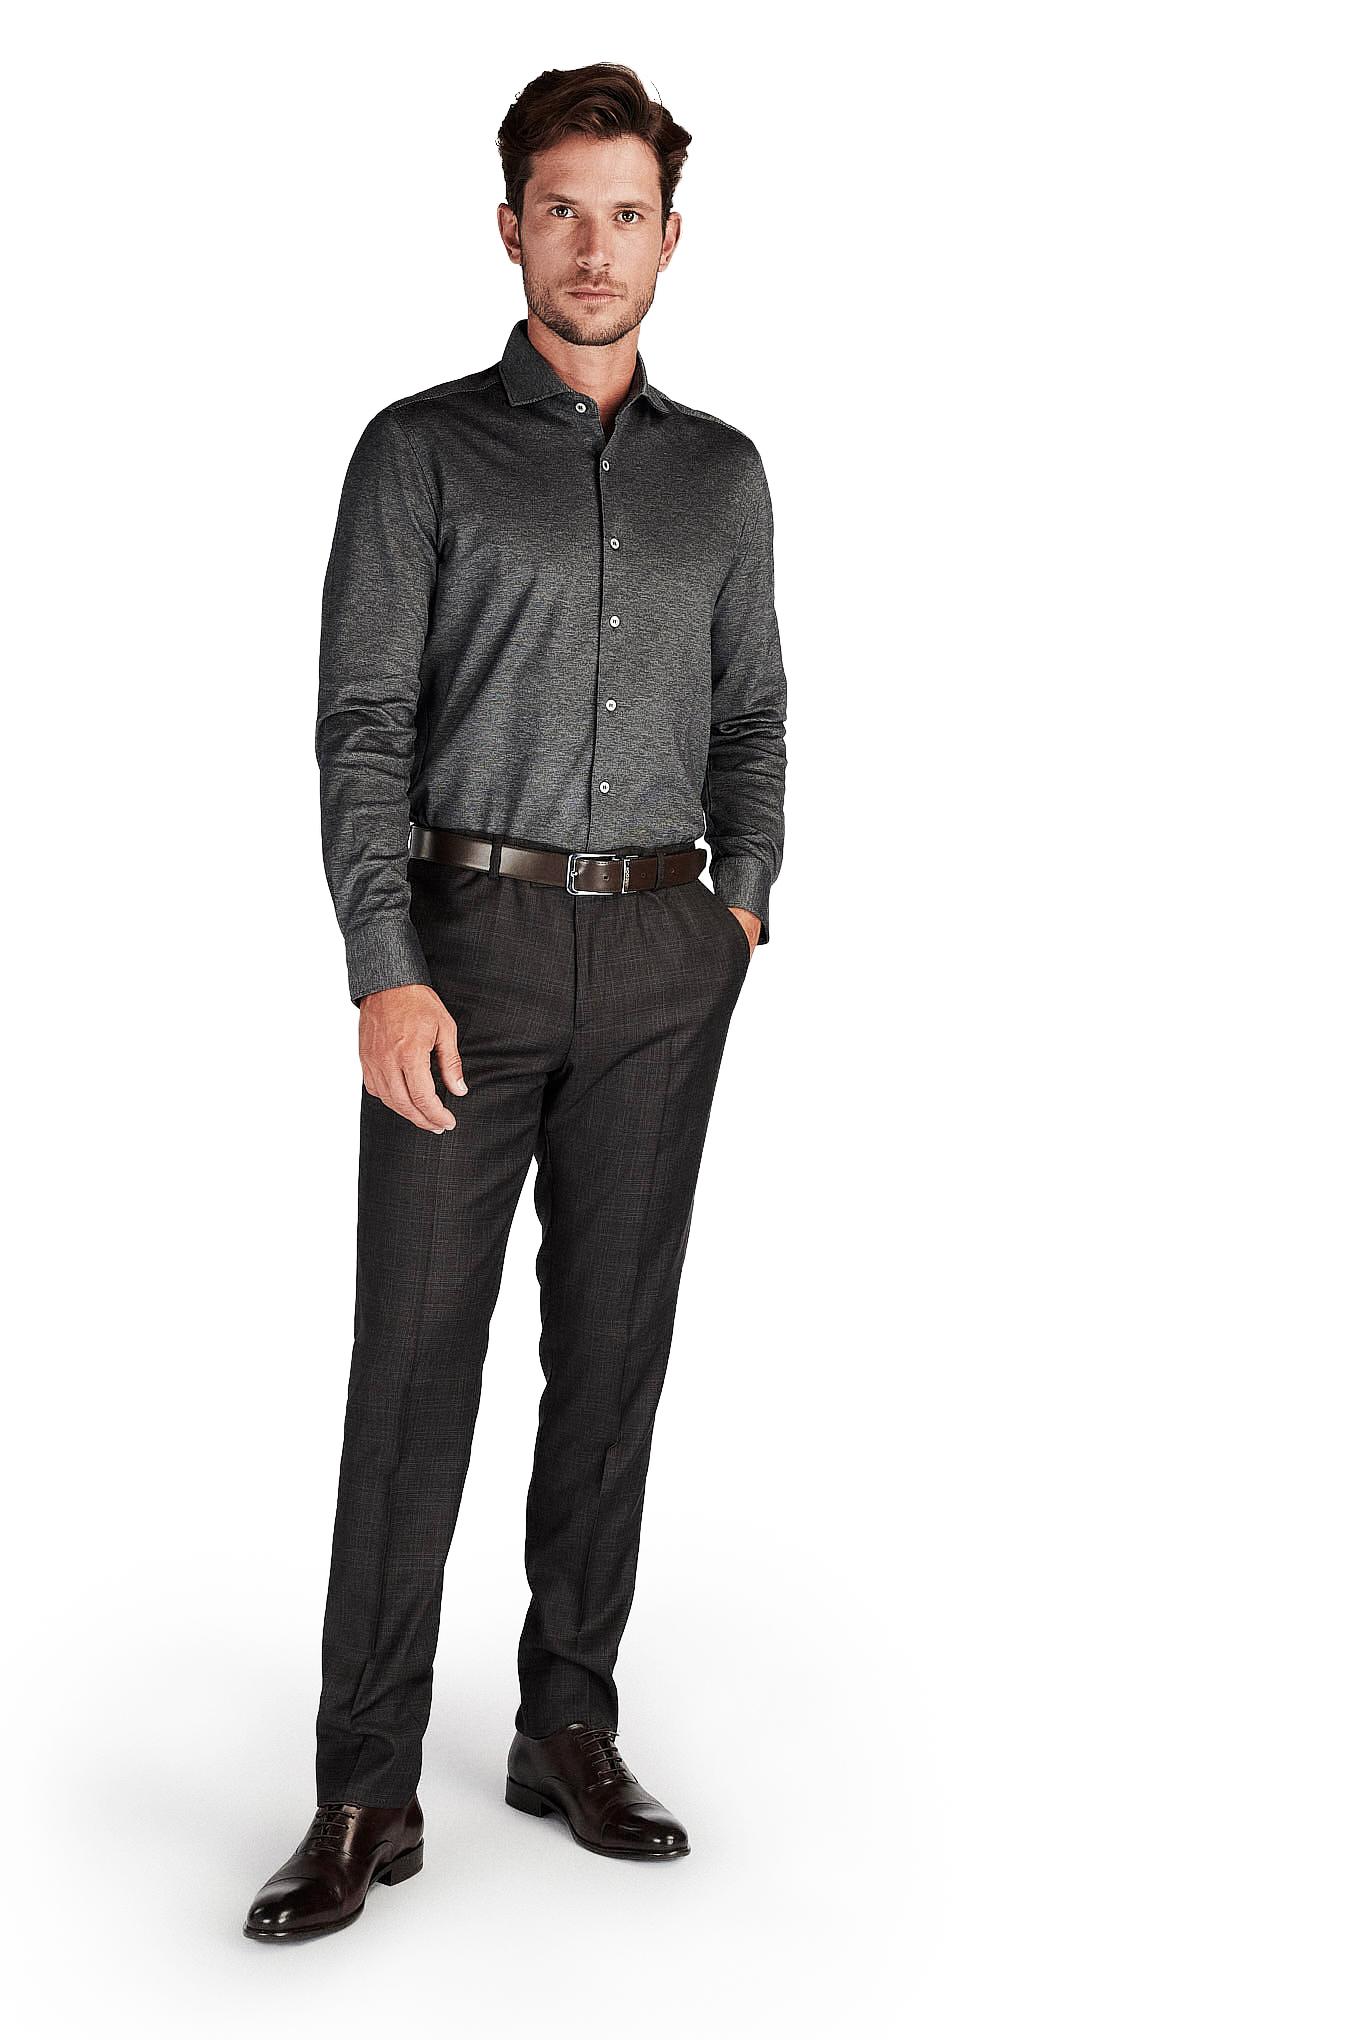 Camisa Cinzento Escuro Casual Homem